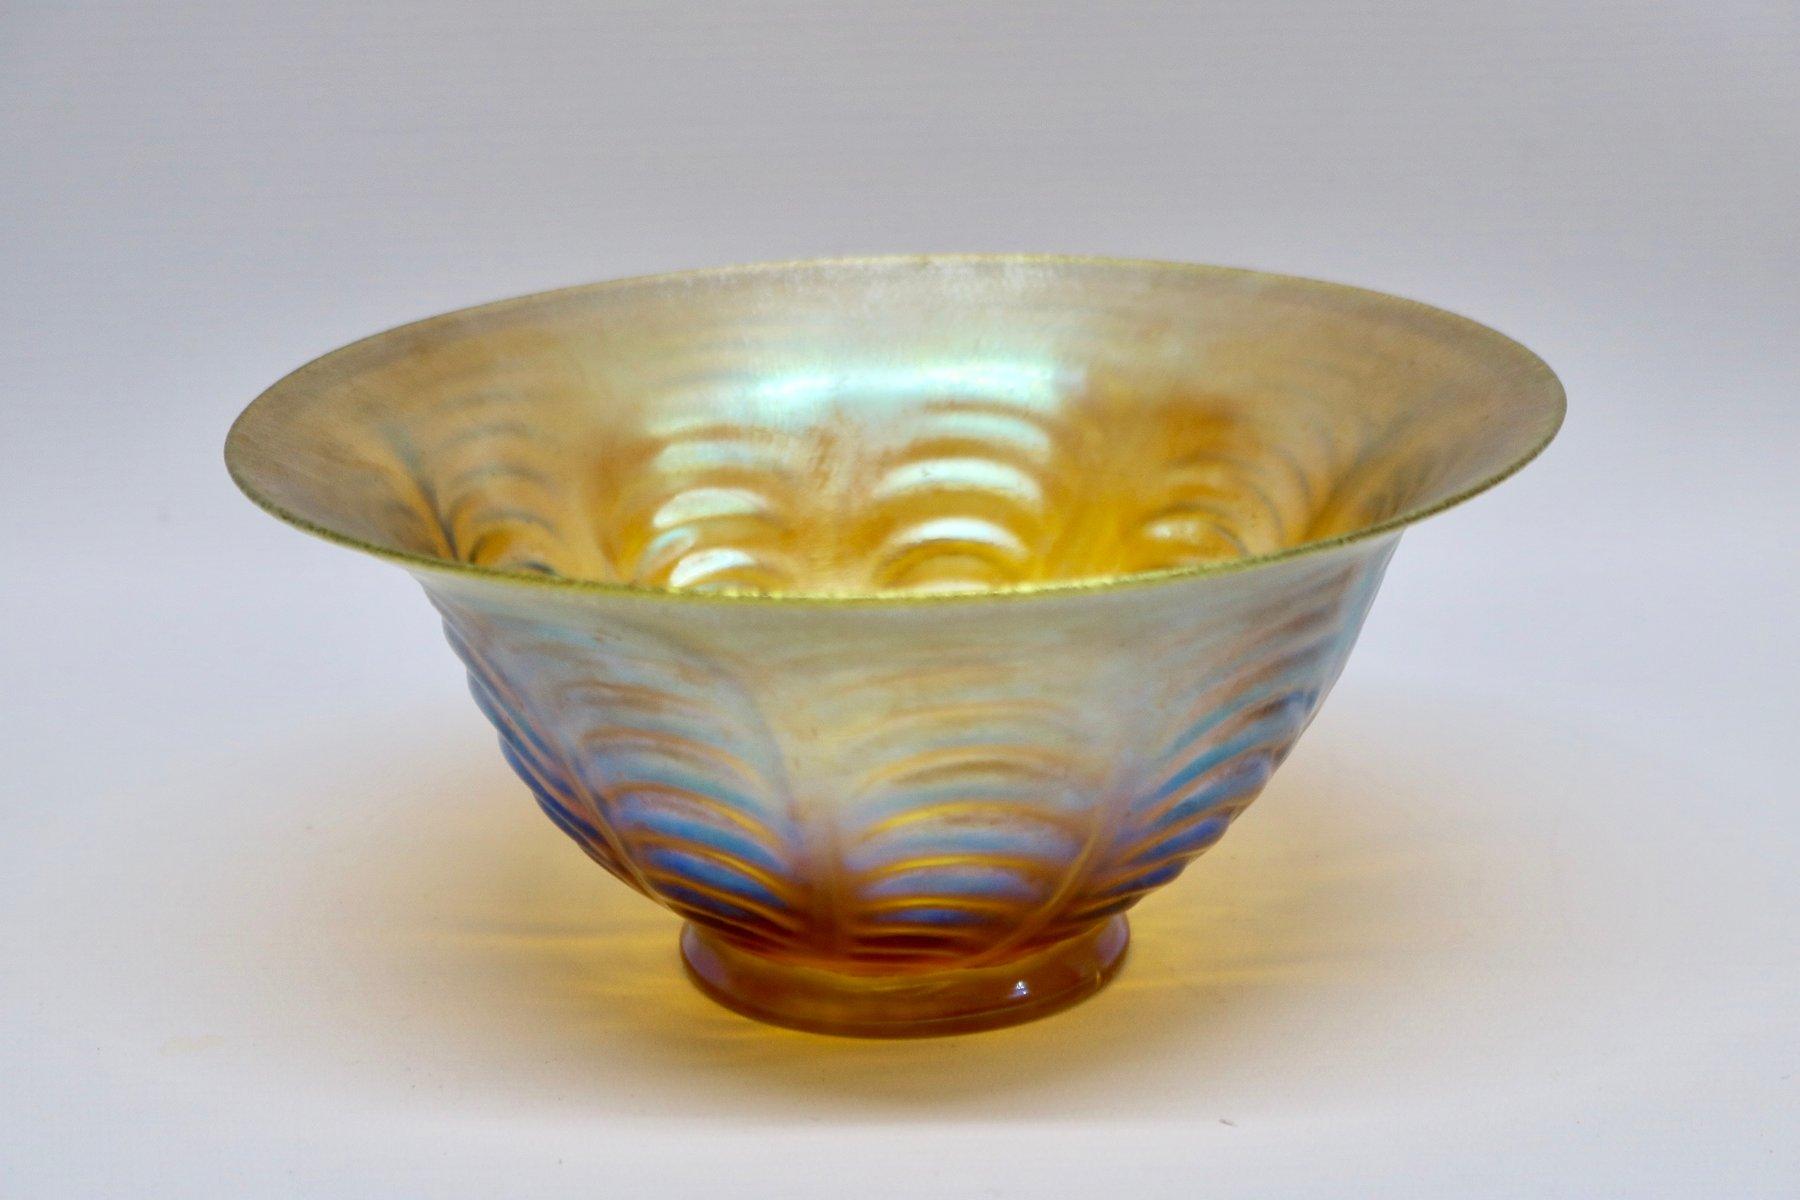 Vintage Mrya Glass Bowl from WMF